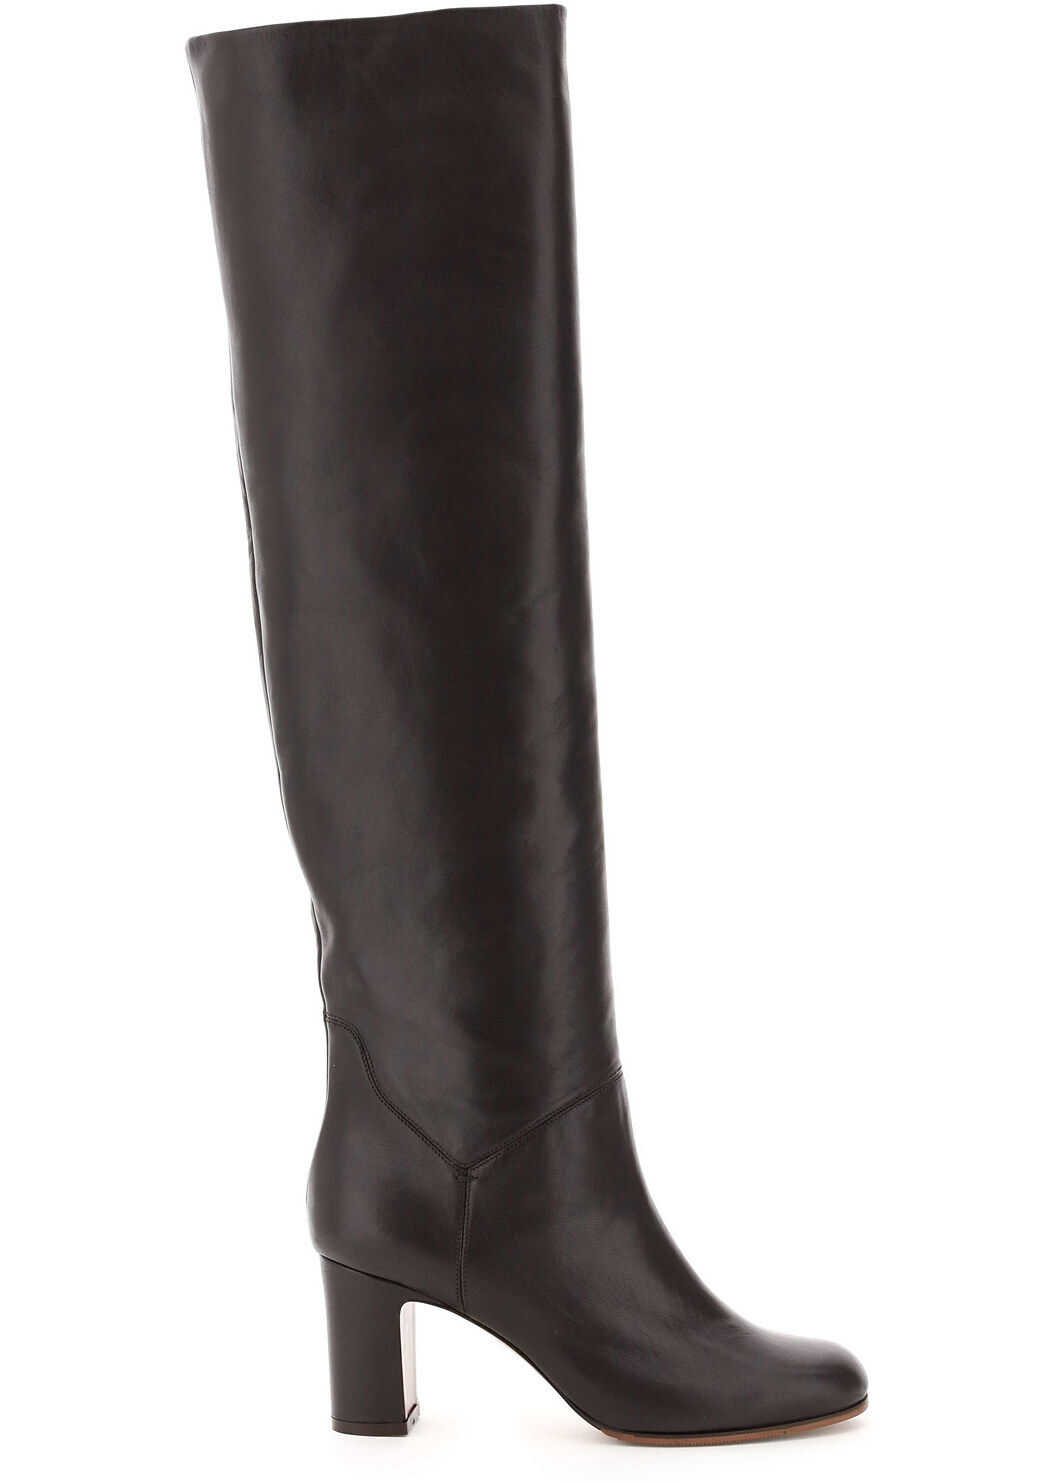 L'Autre Chose High Nappa Boots LD2551 80WP2615 T MORO imagine b-mall.ro